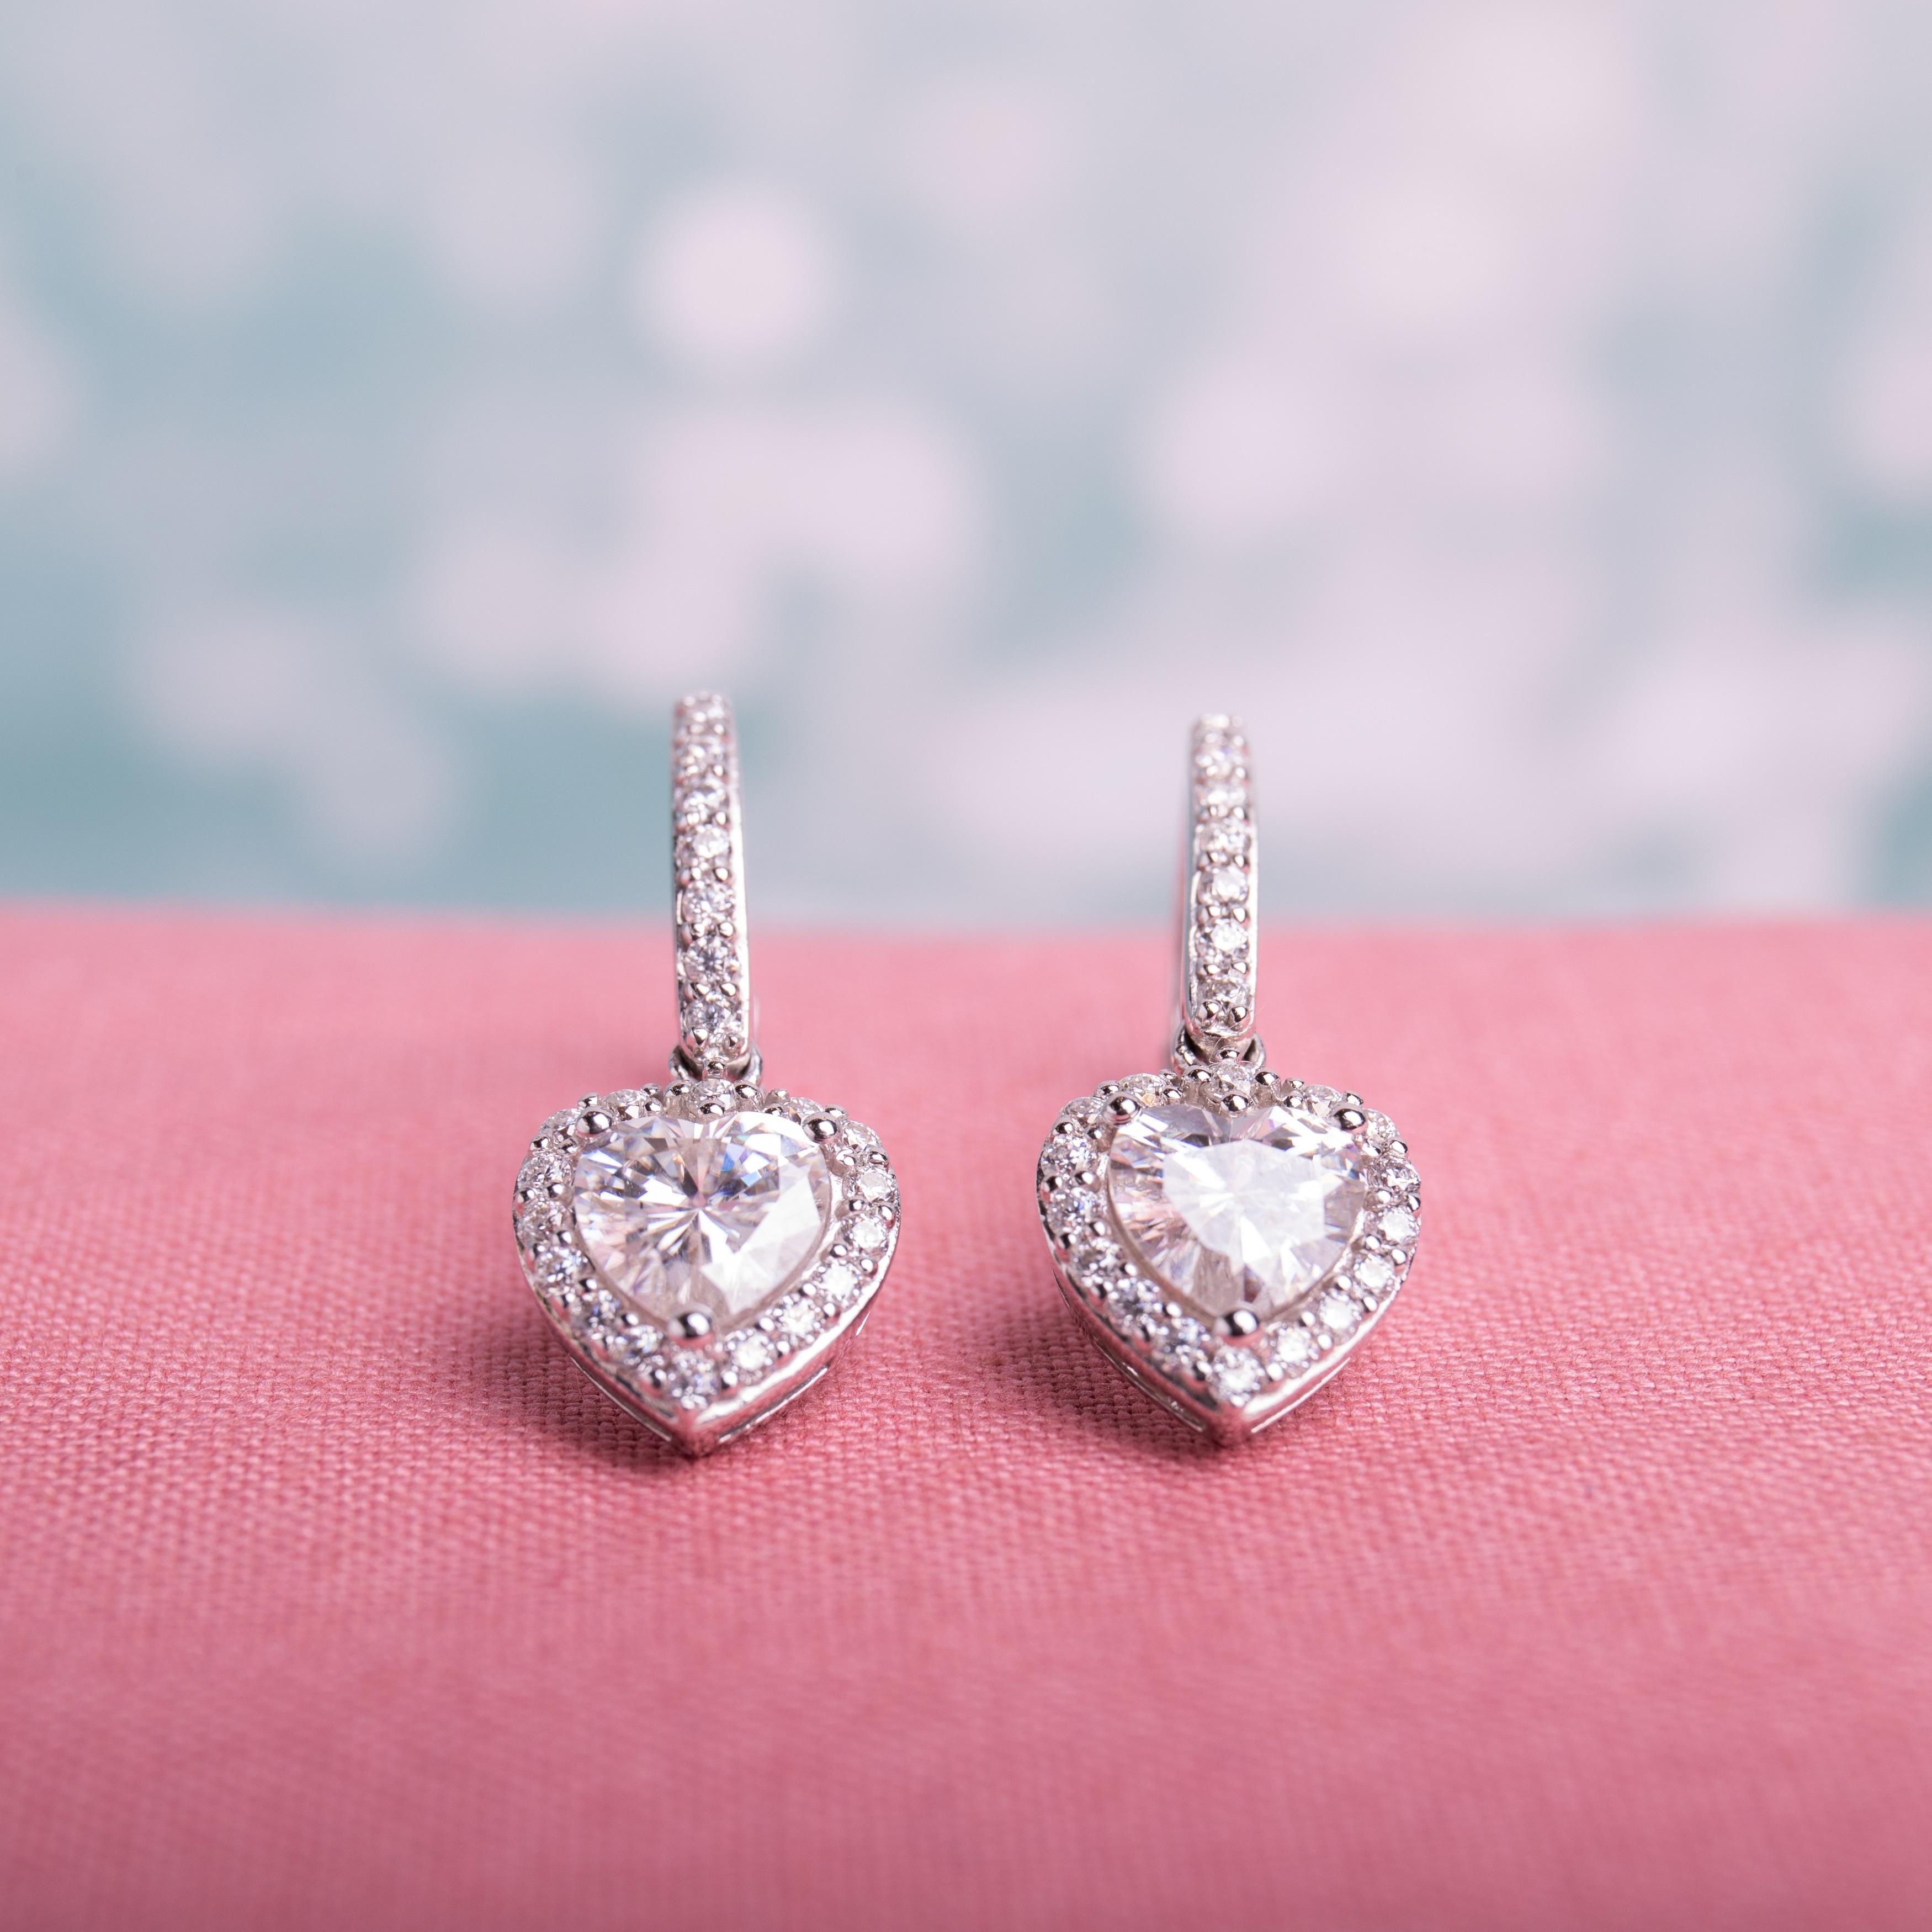 1Ct Round Cut Moissanite Chandelier Drop /& Dangle Earrings14K White Gold Finish